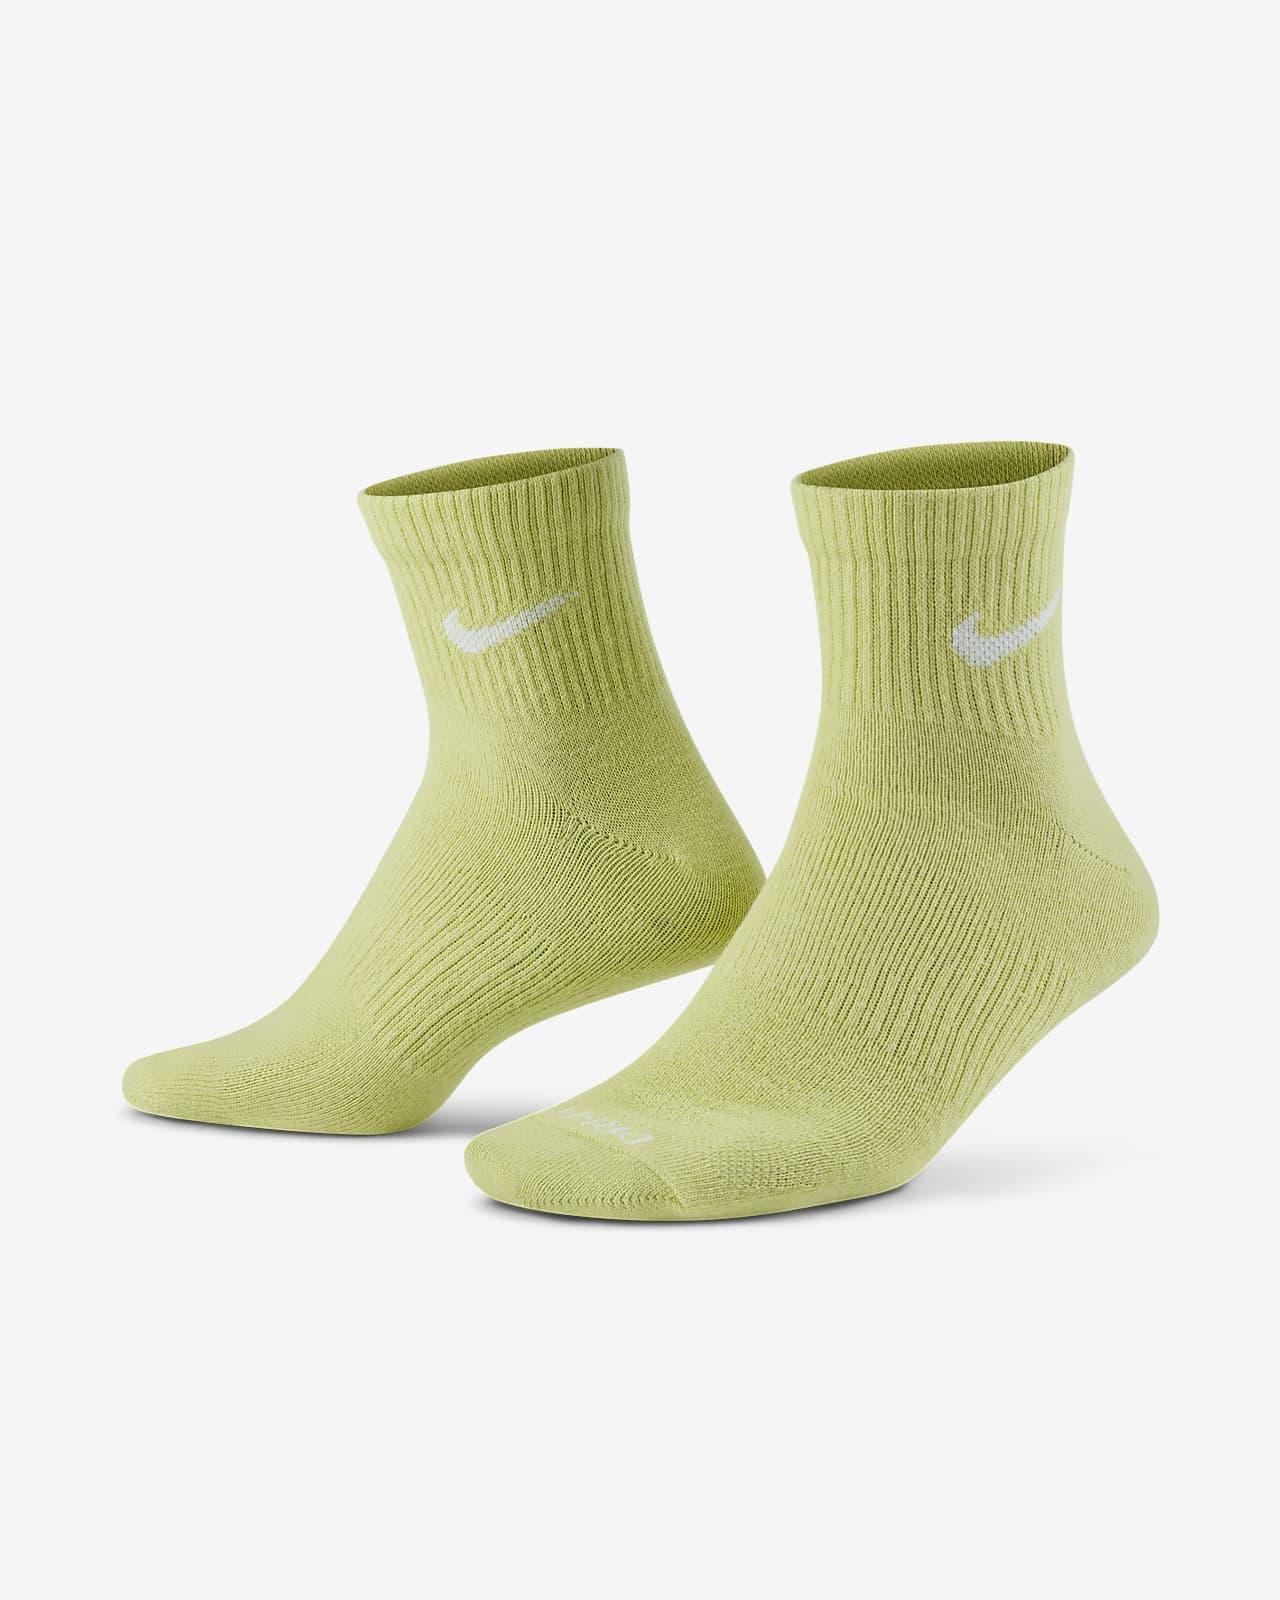 Nike Everyday Plus Lightweight Training Ankle Socks (3 Pairs)